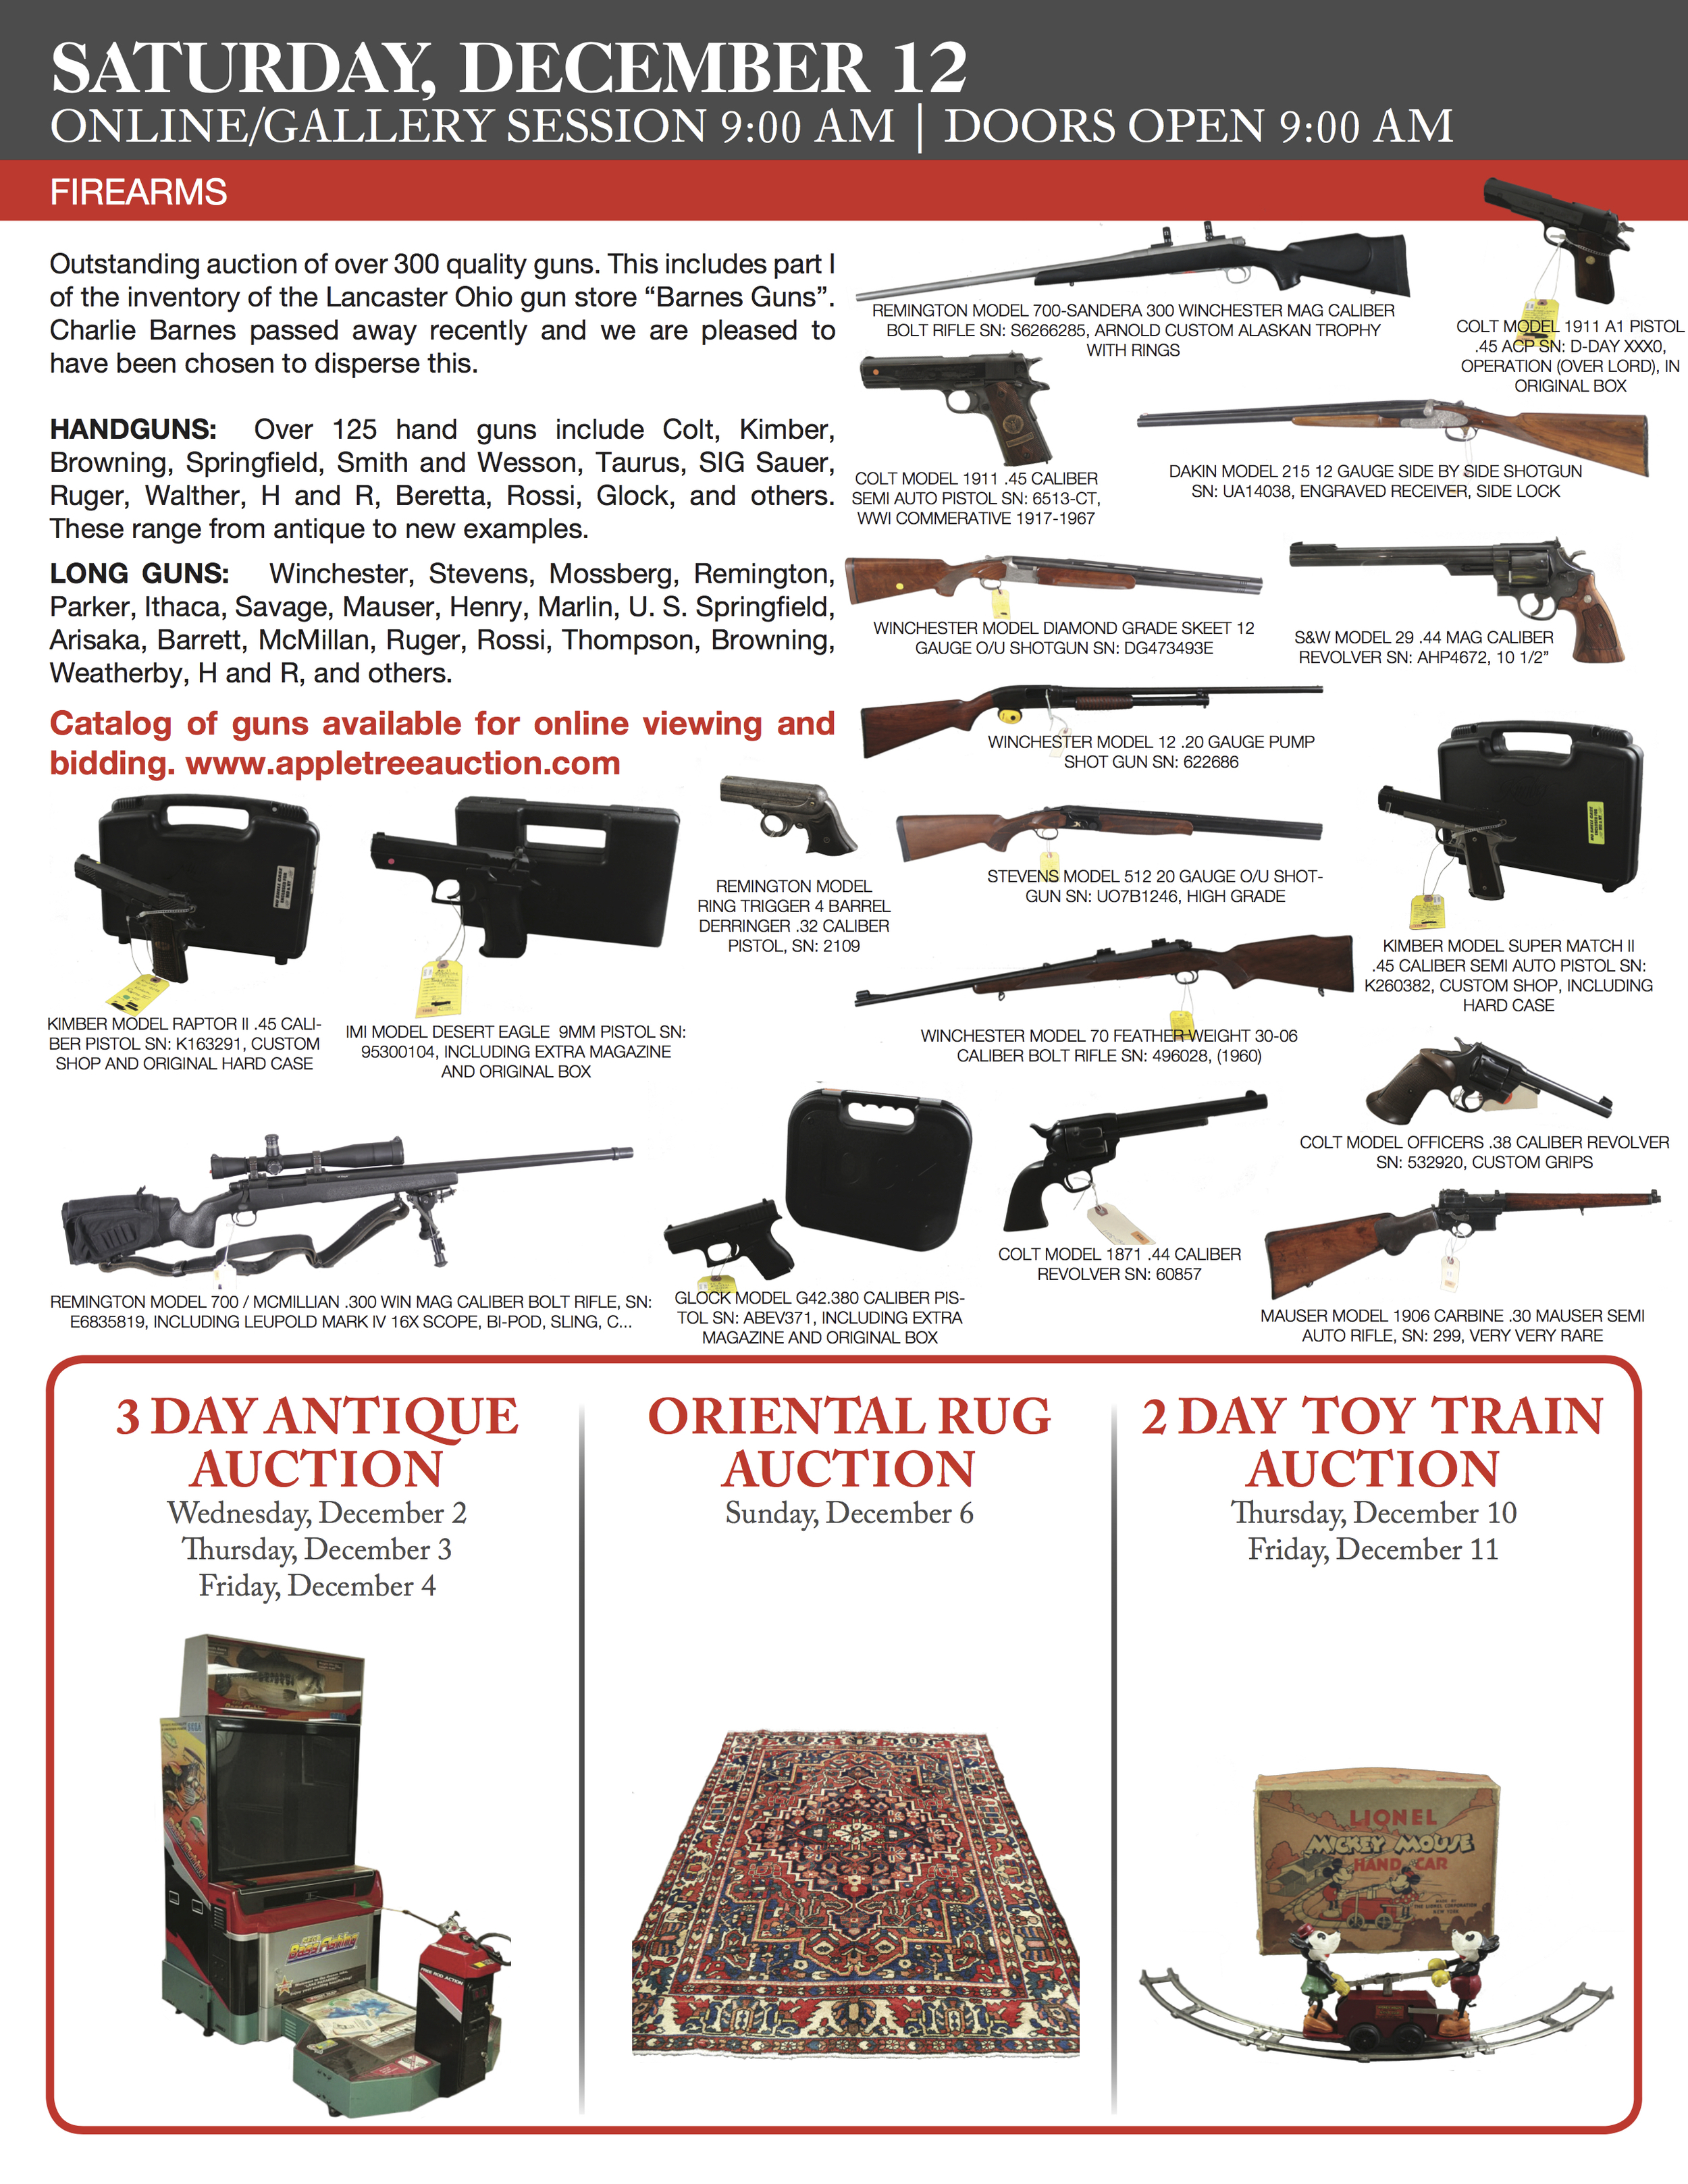 Military & Firearms Dec Auction 15 high res_3.jpg